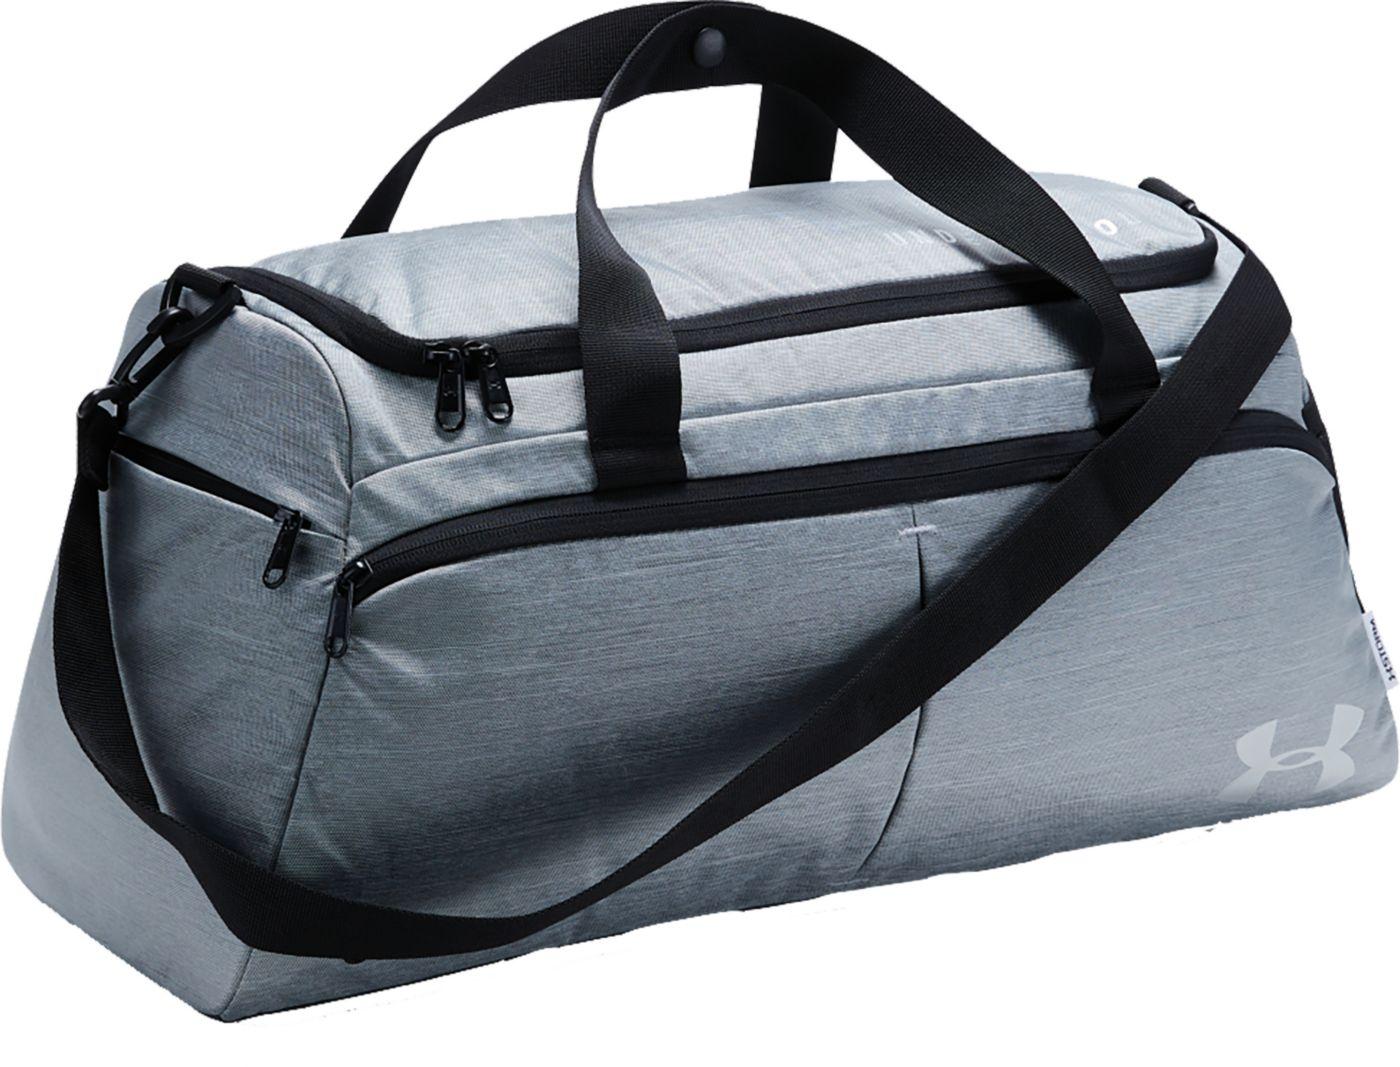 Under Armour Women's Undeniable Duffle Bag